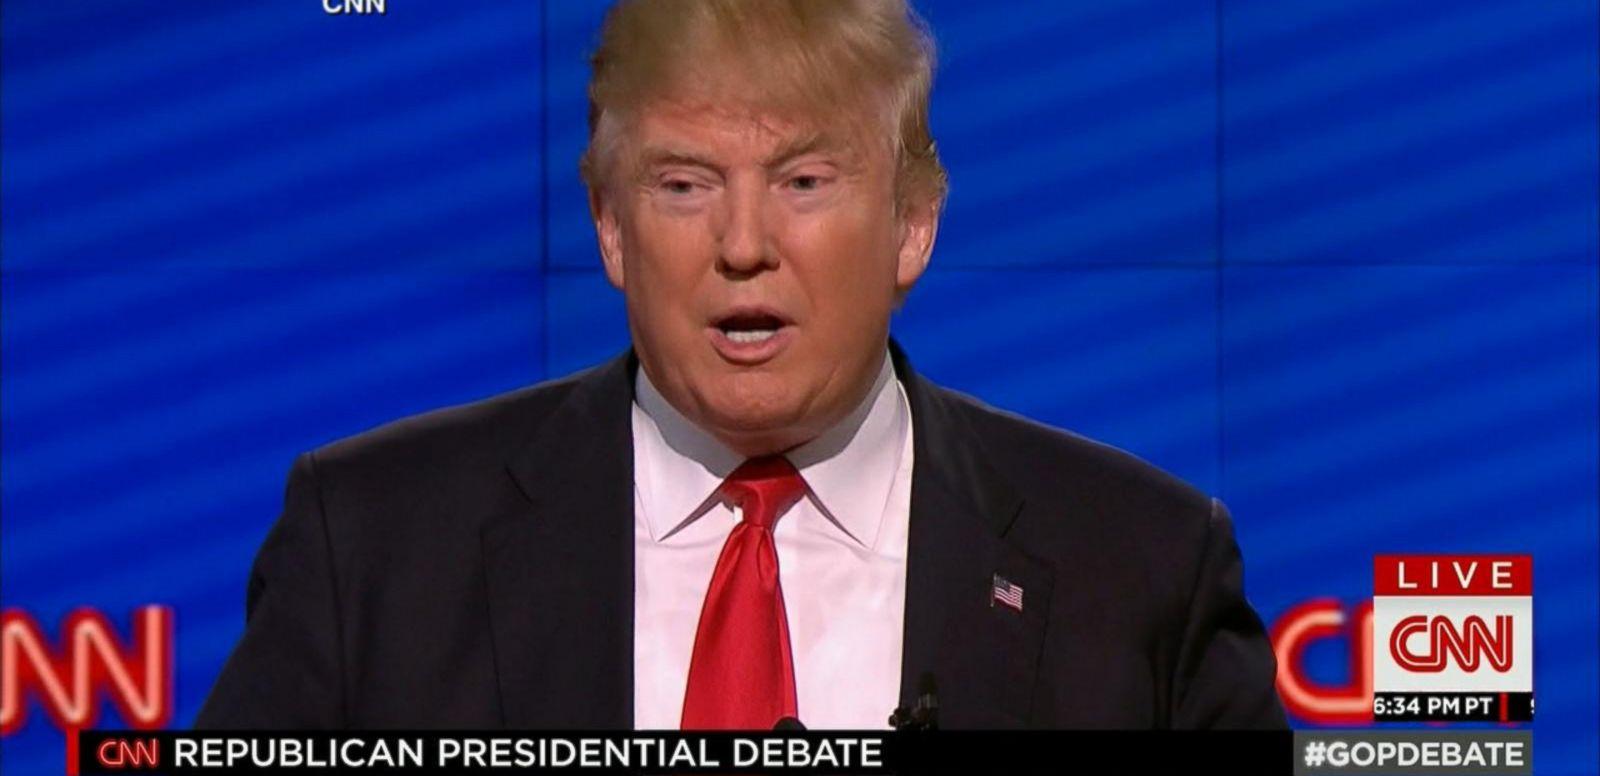 VIDEO: GOP Candidates Seem To Attack Trump Less In Recent Debate